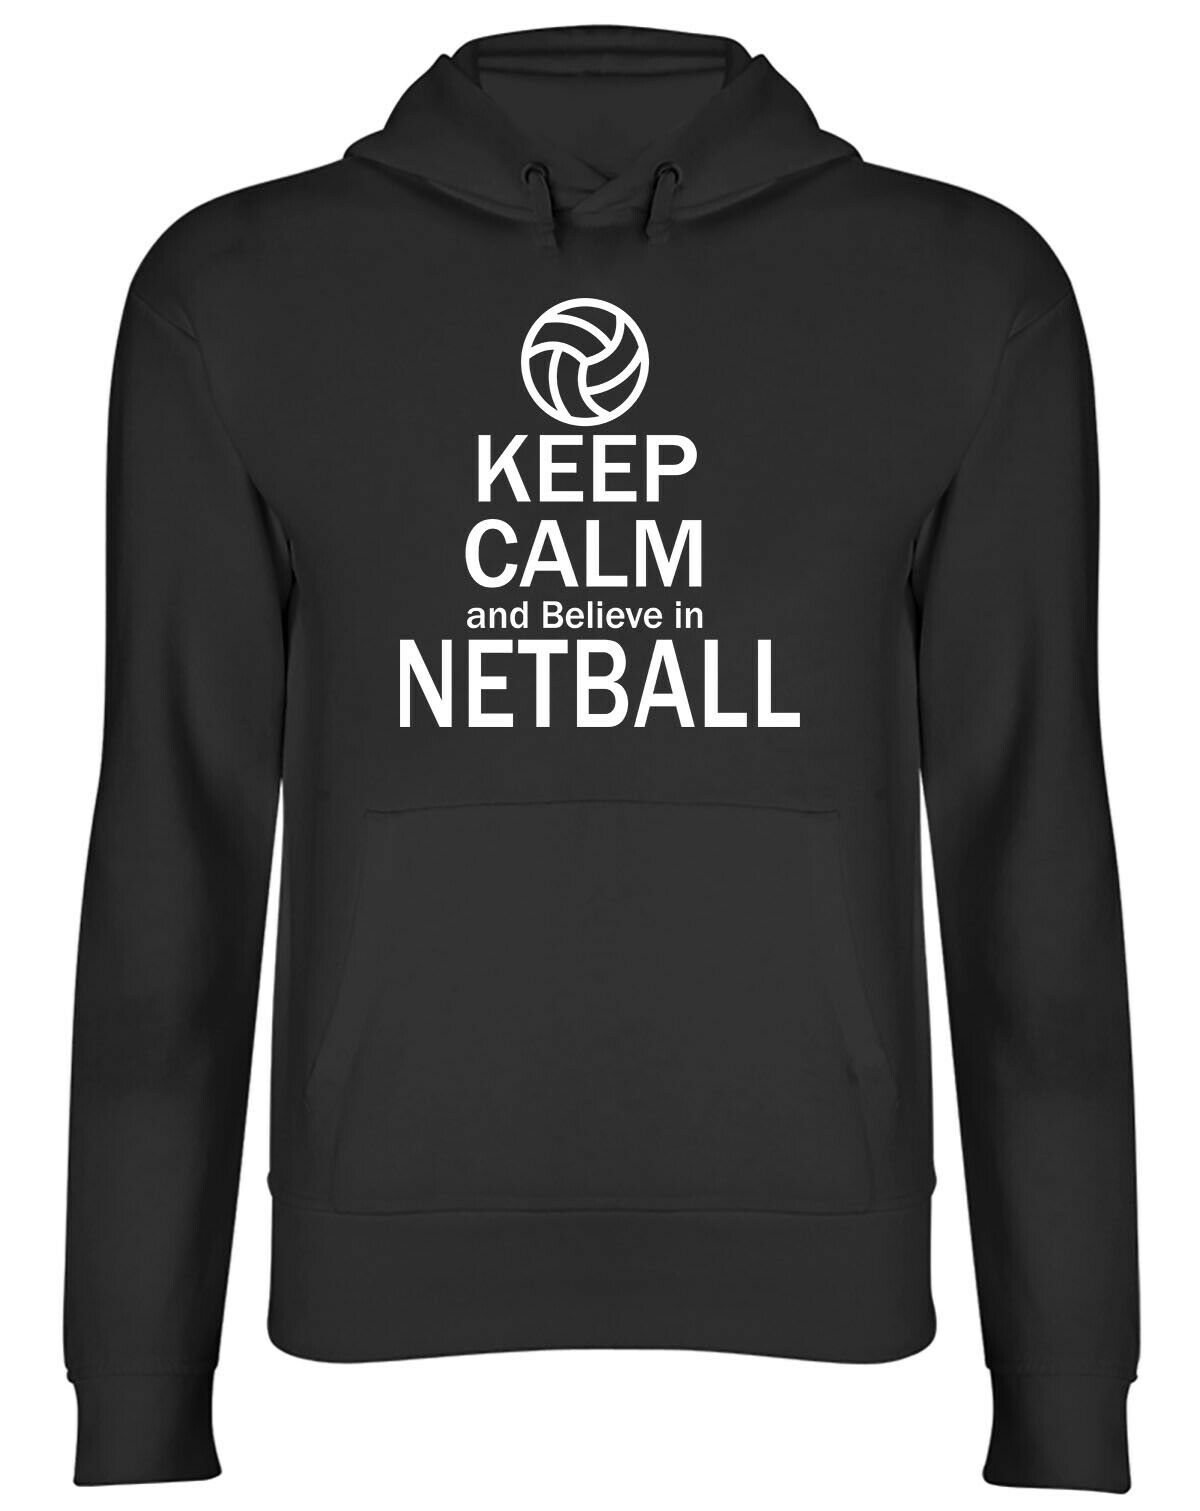 Keep Calm and Believe in Netball Mens Womens Hooded Top Hoodie